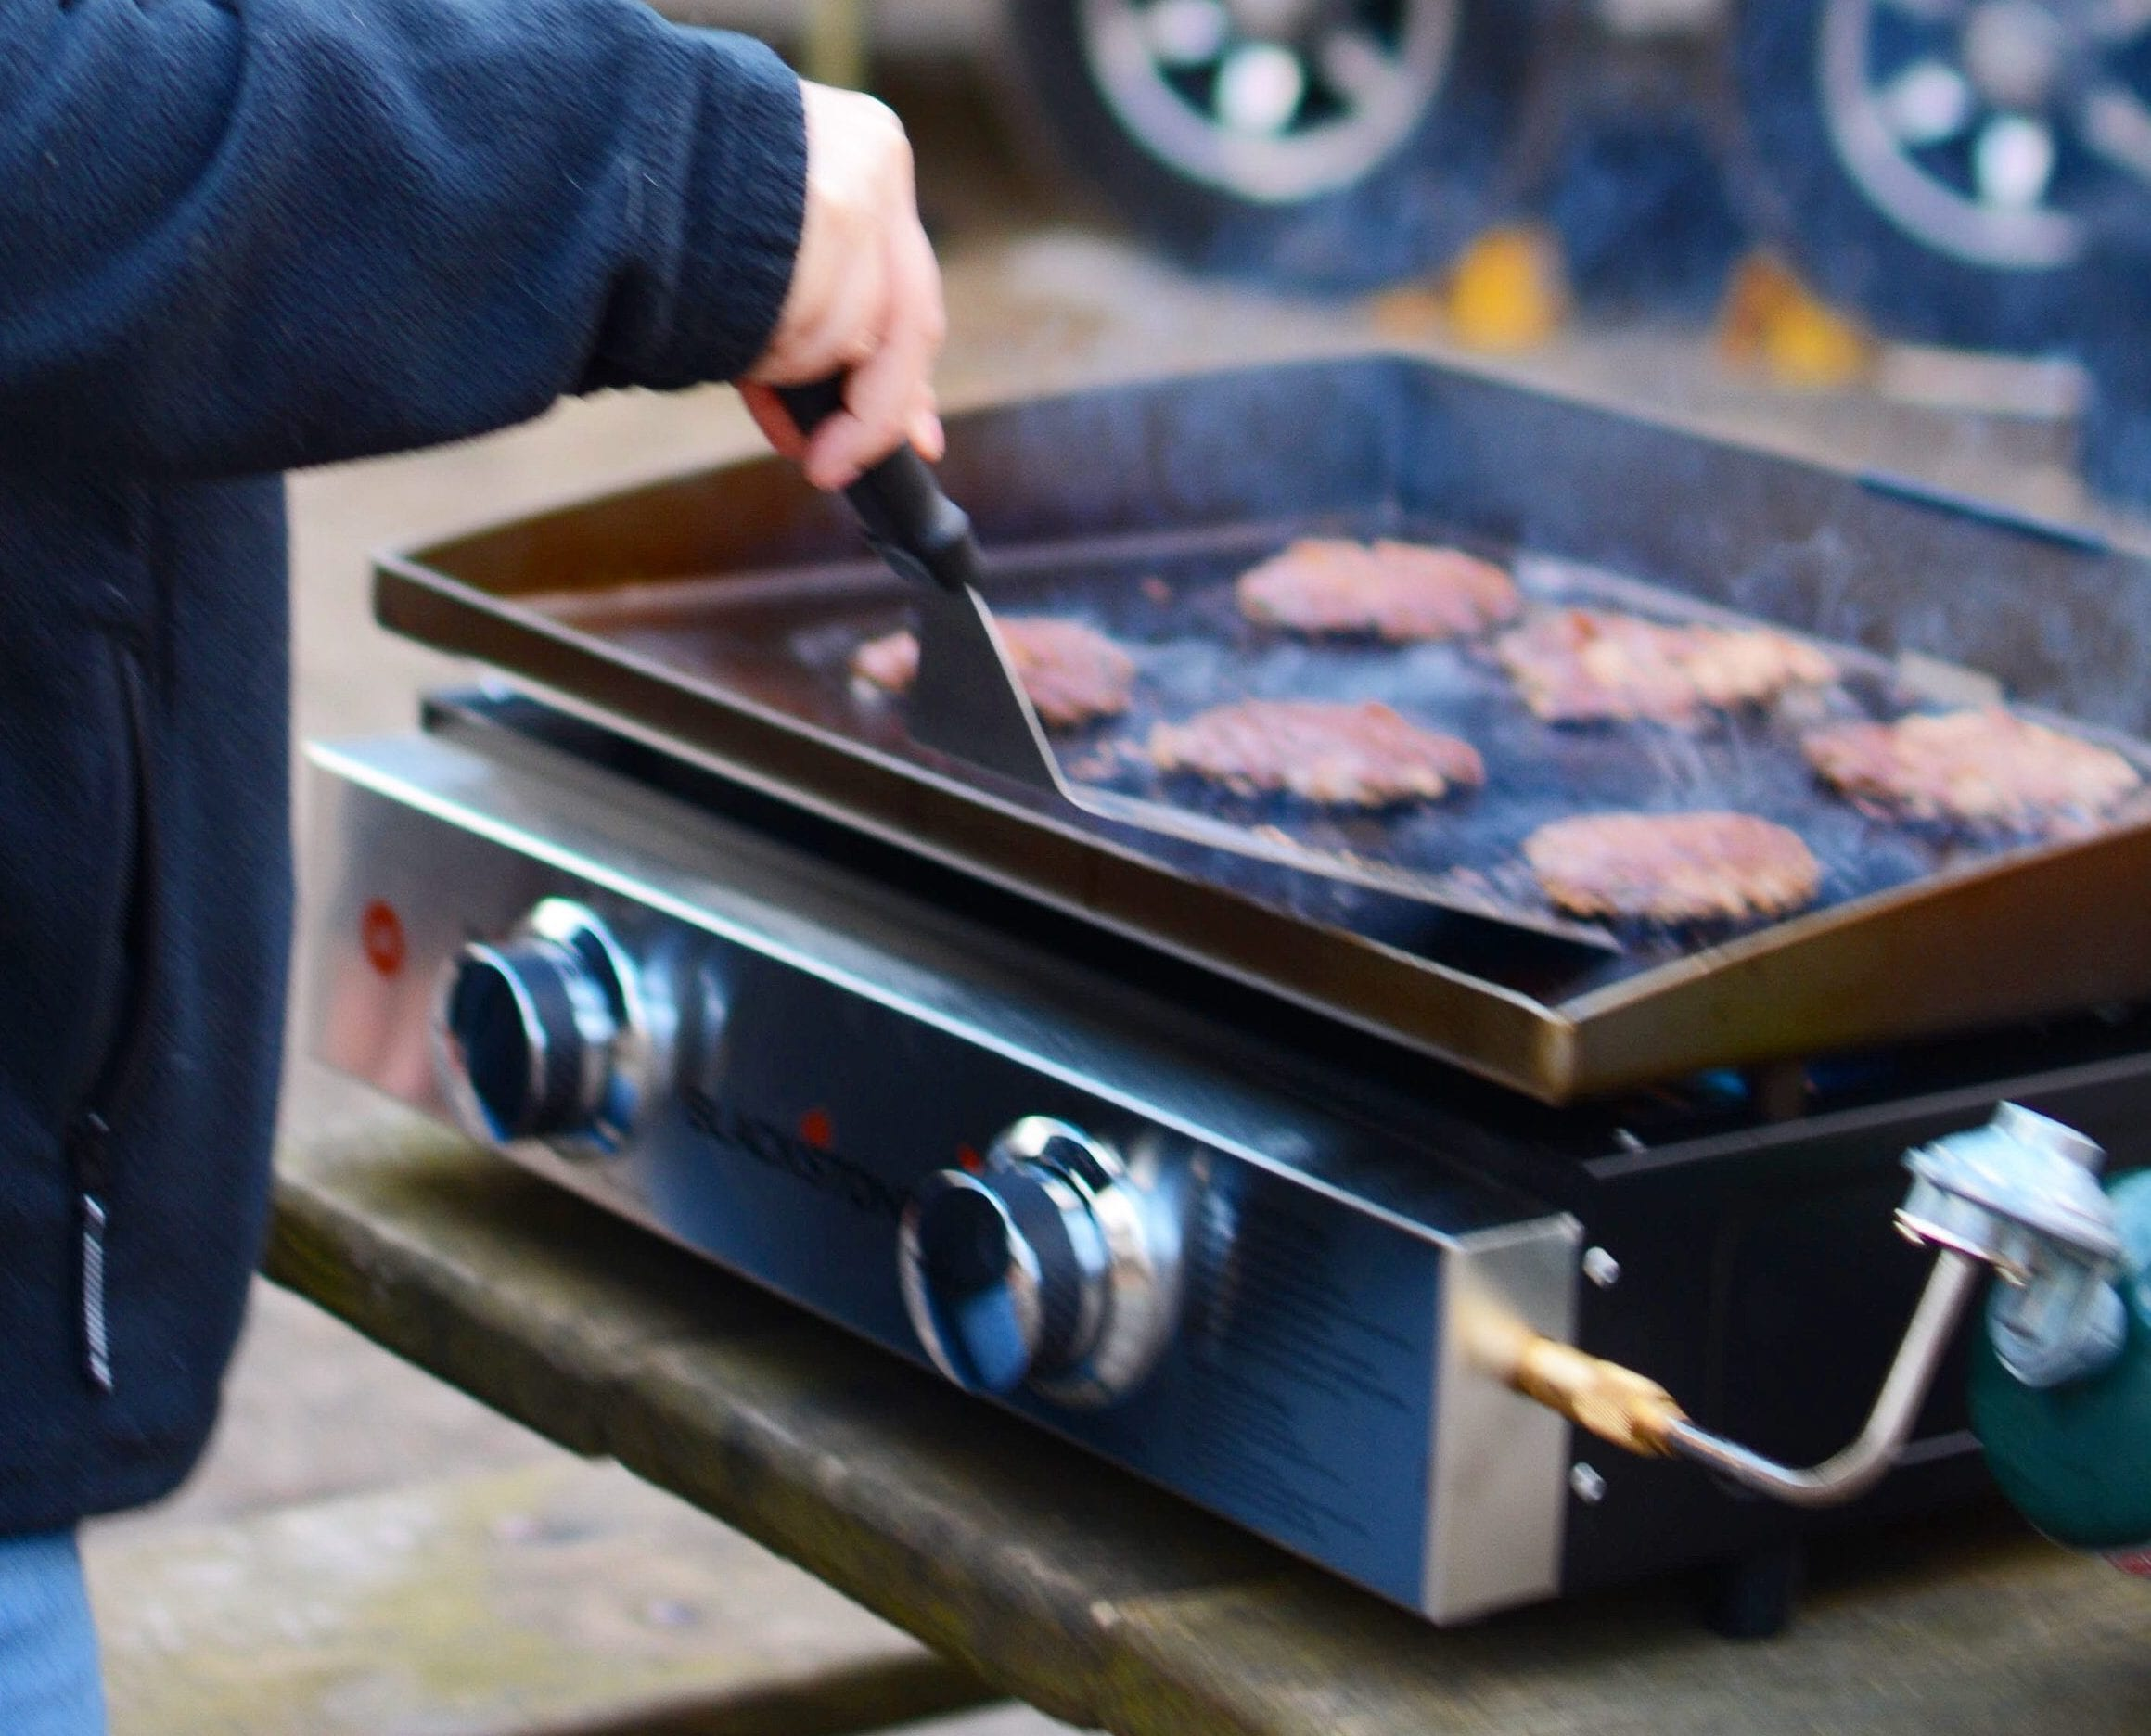 Making Perfect Smash Burgers With Blackstone S Chef Nathan Lippy The Rv Atlas